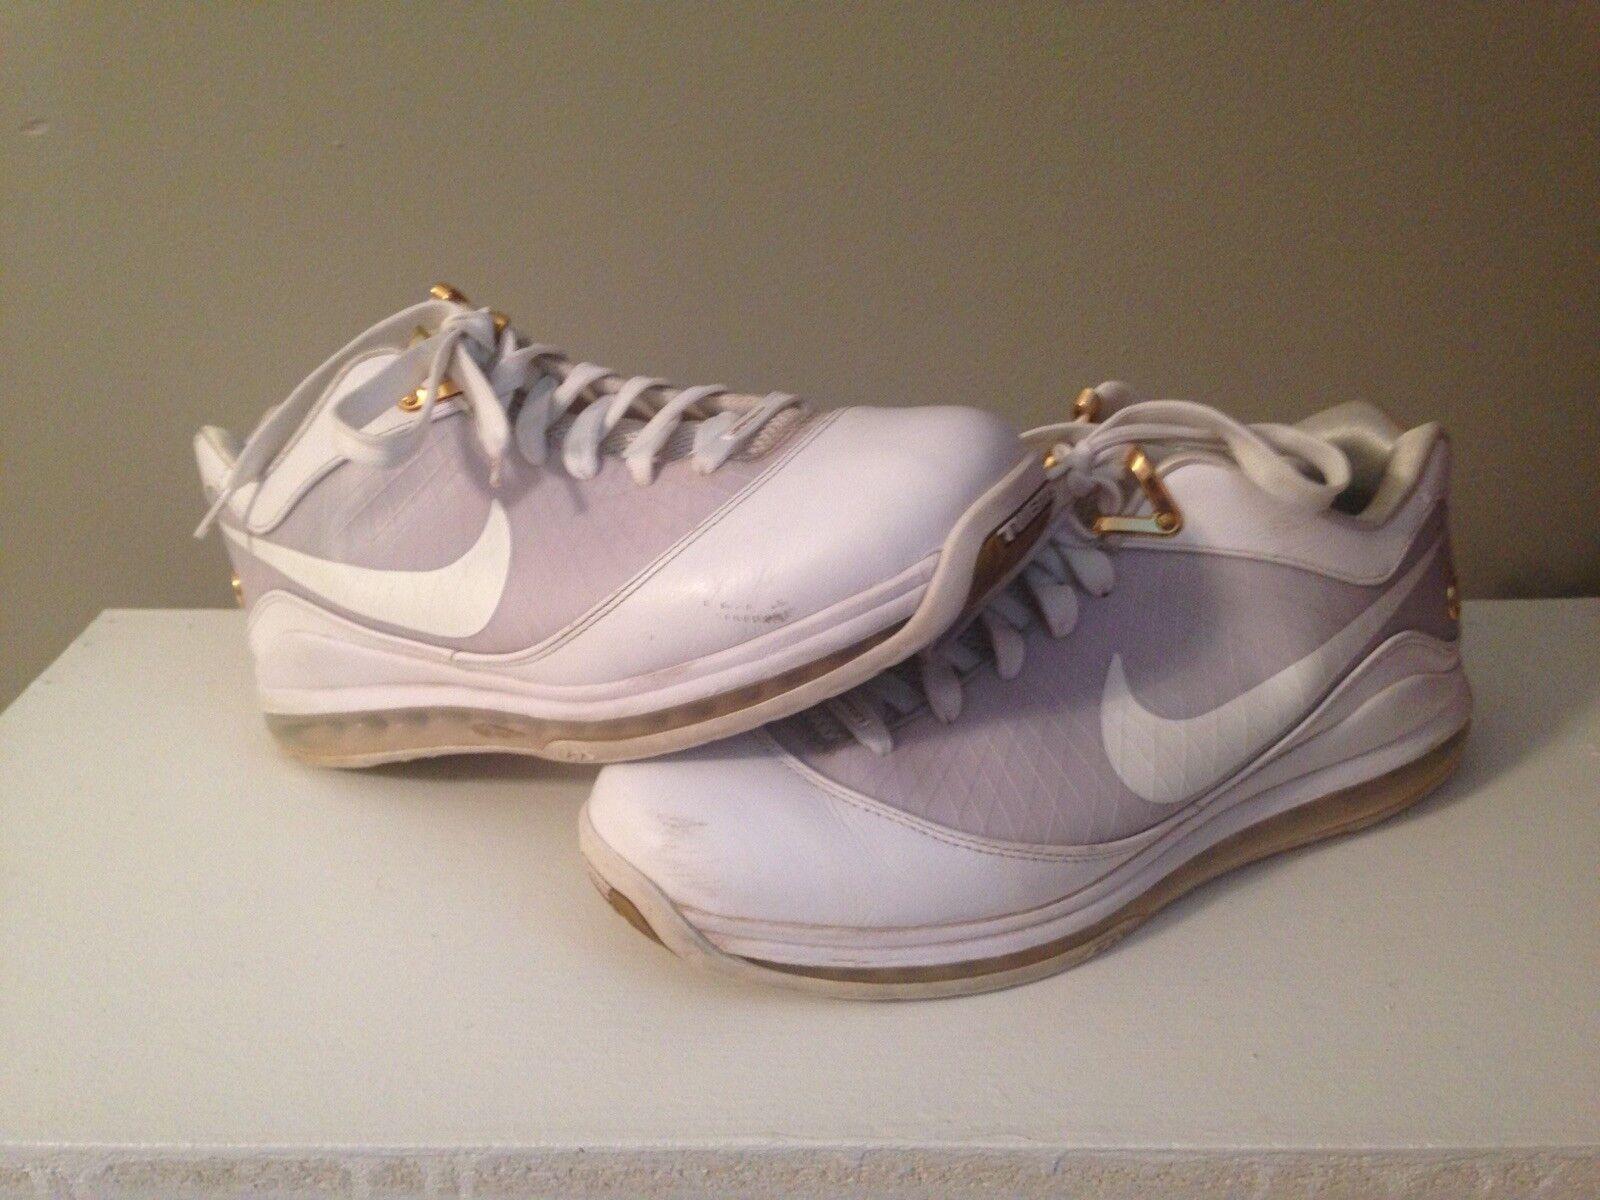 Lebron 7 bianco / mettalic oro nike scarpe da basket 44